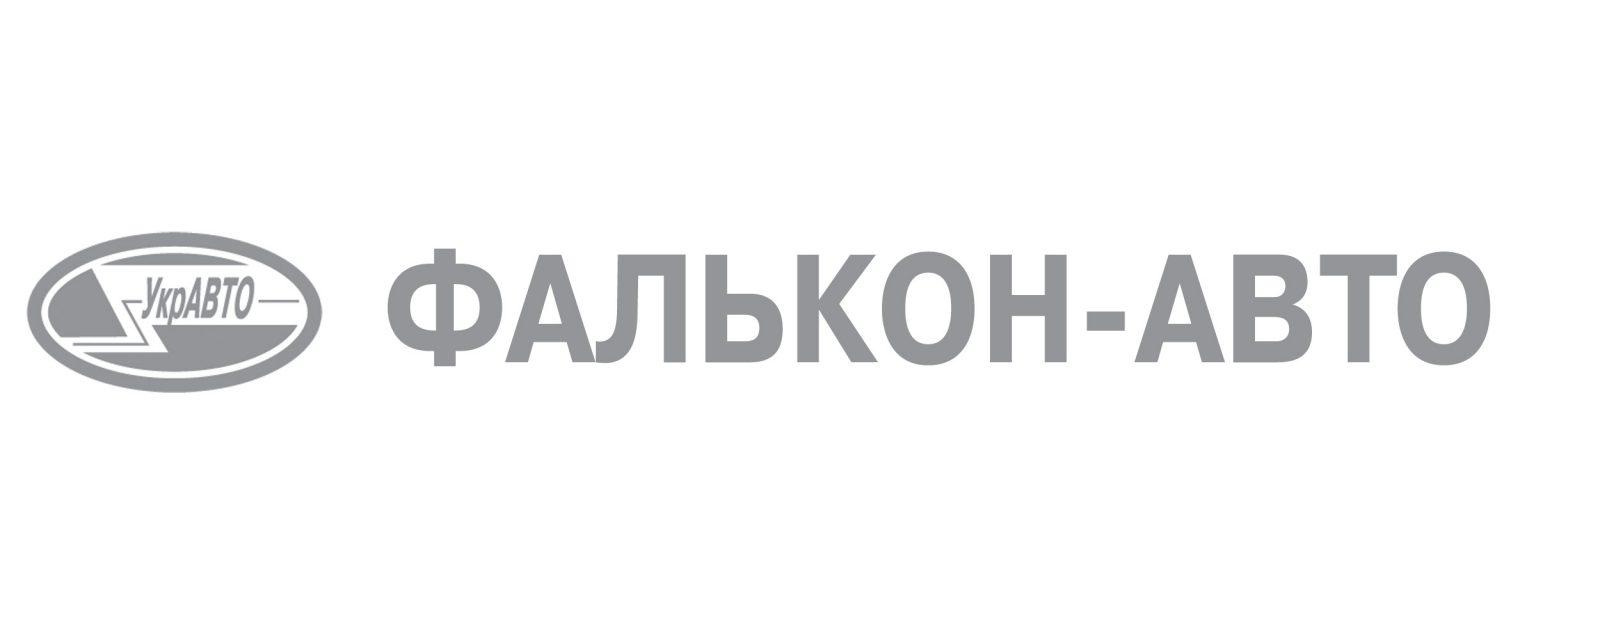 Falkon_logo_Ukr_final